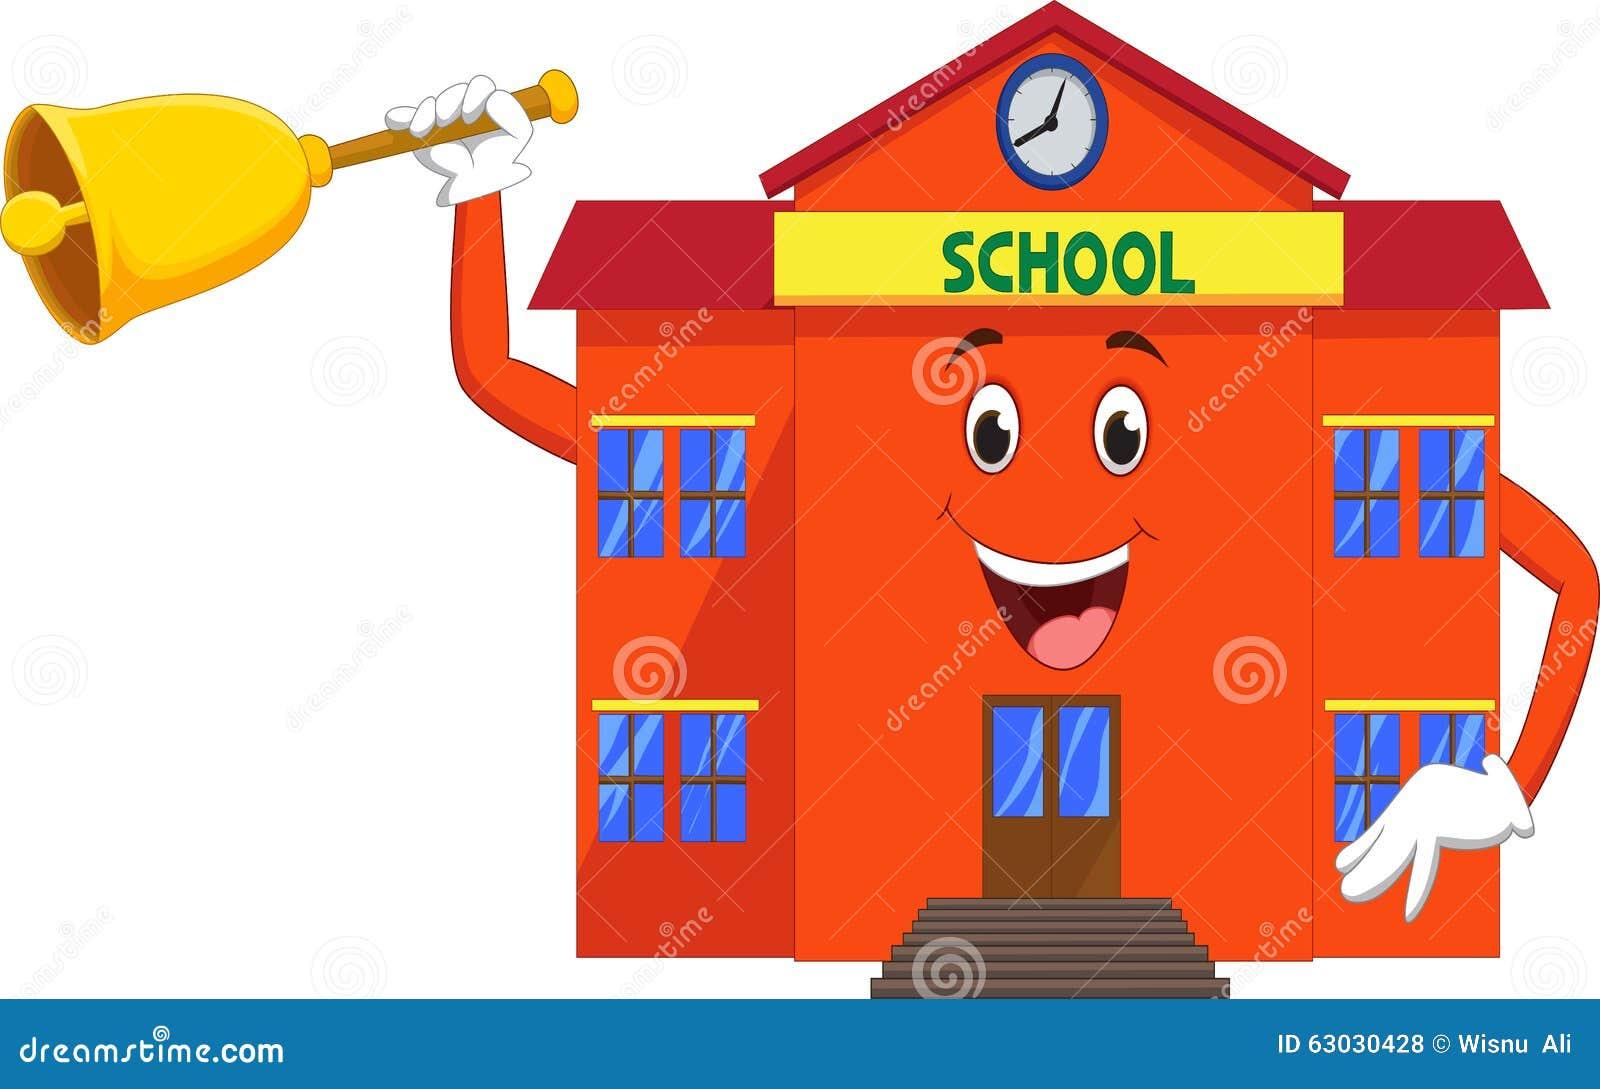 Cartoon school with bell in hand